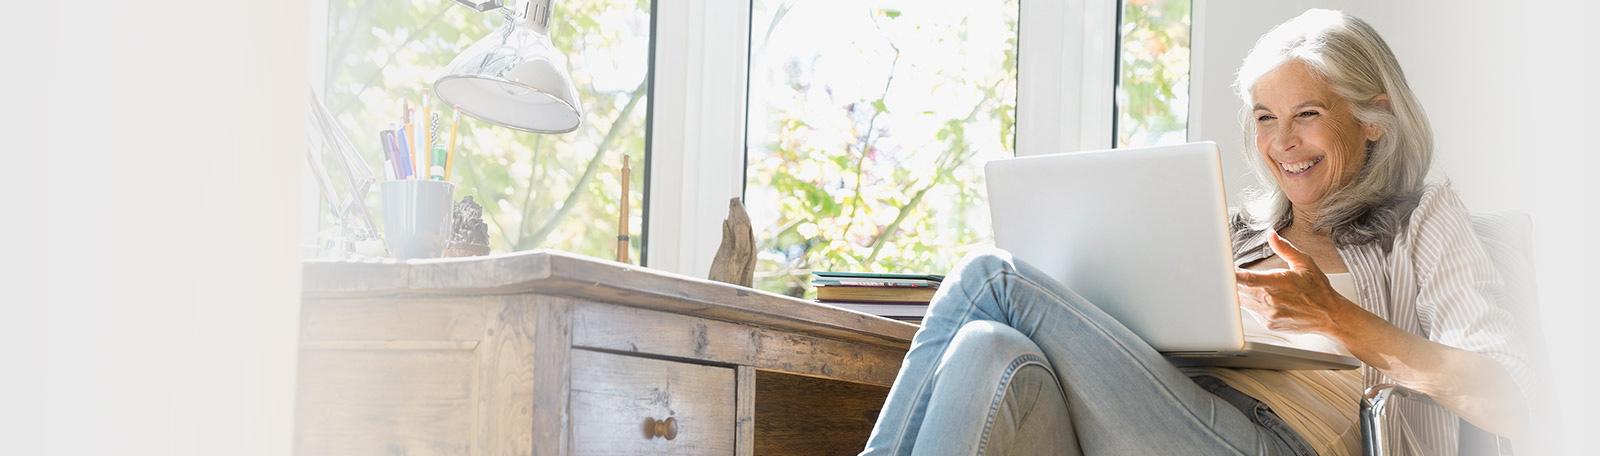 internet dating online sites for females